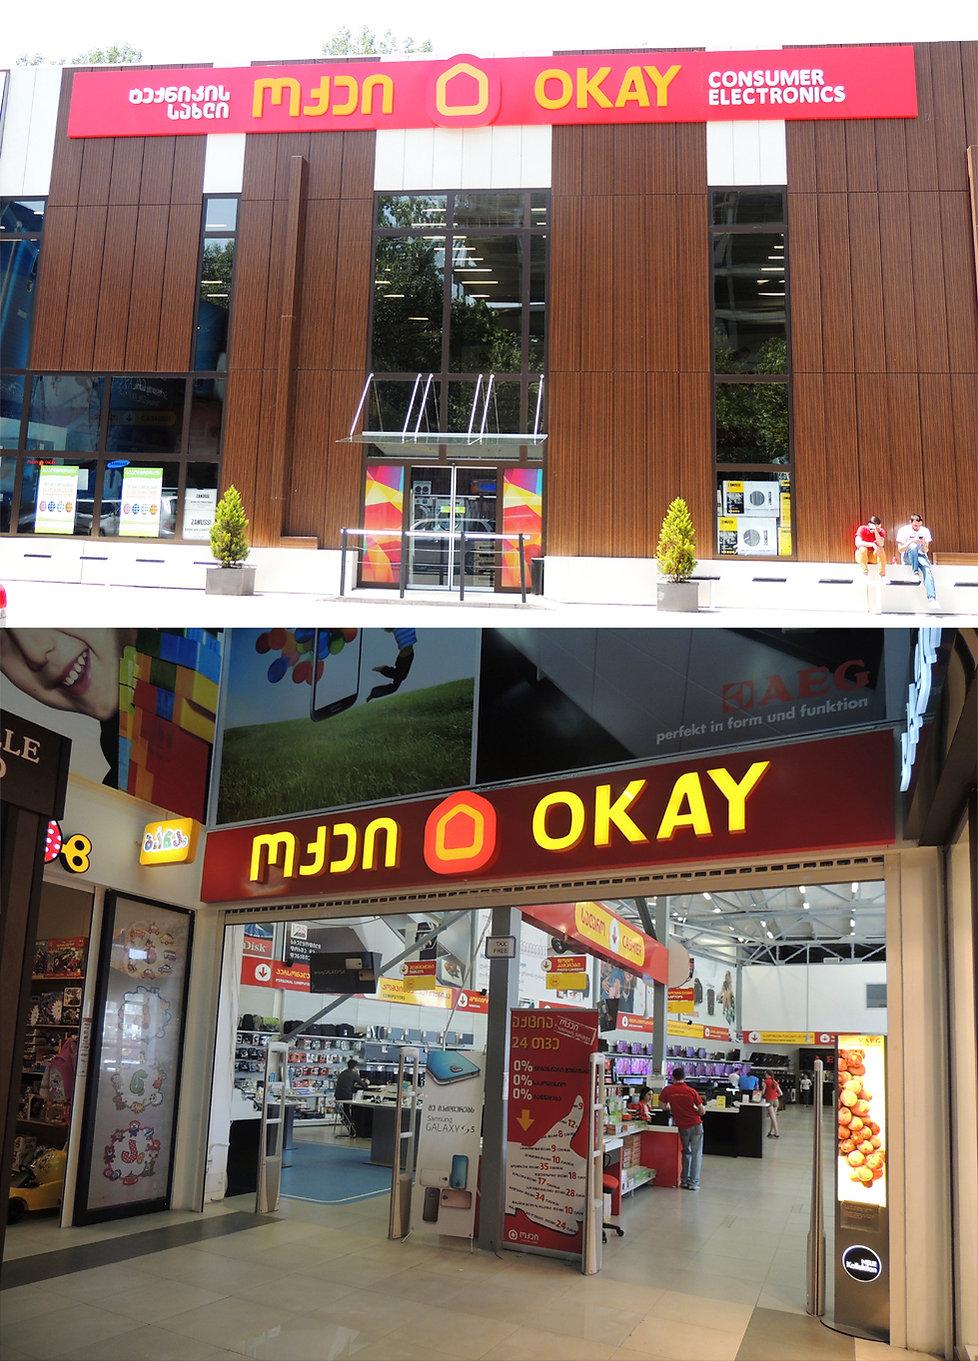 фасад магазина дизайн okay